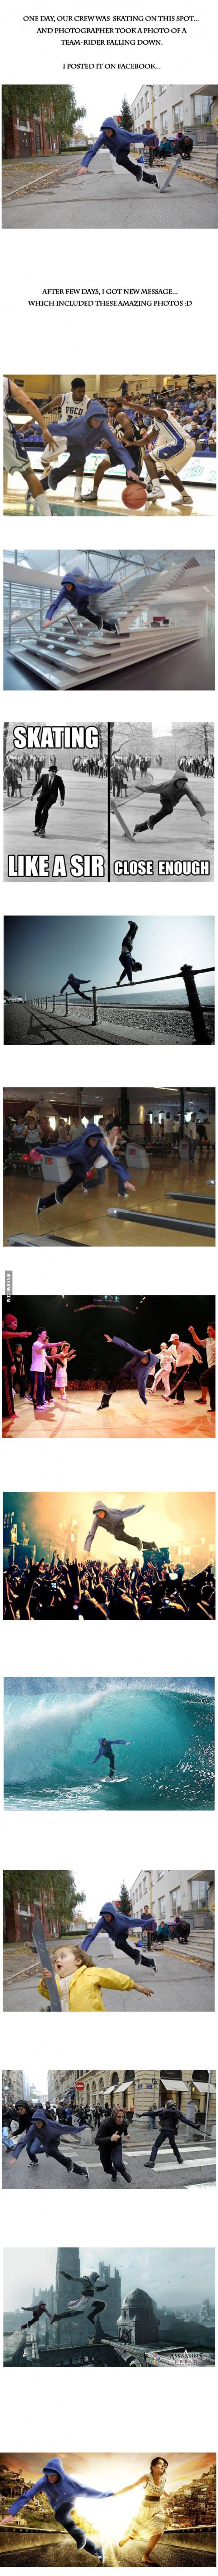 Photoshop meets skateboarding